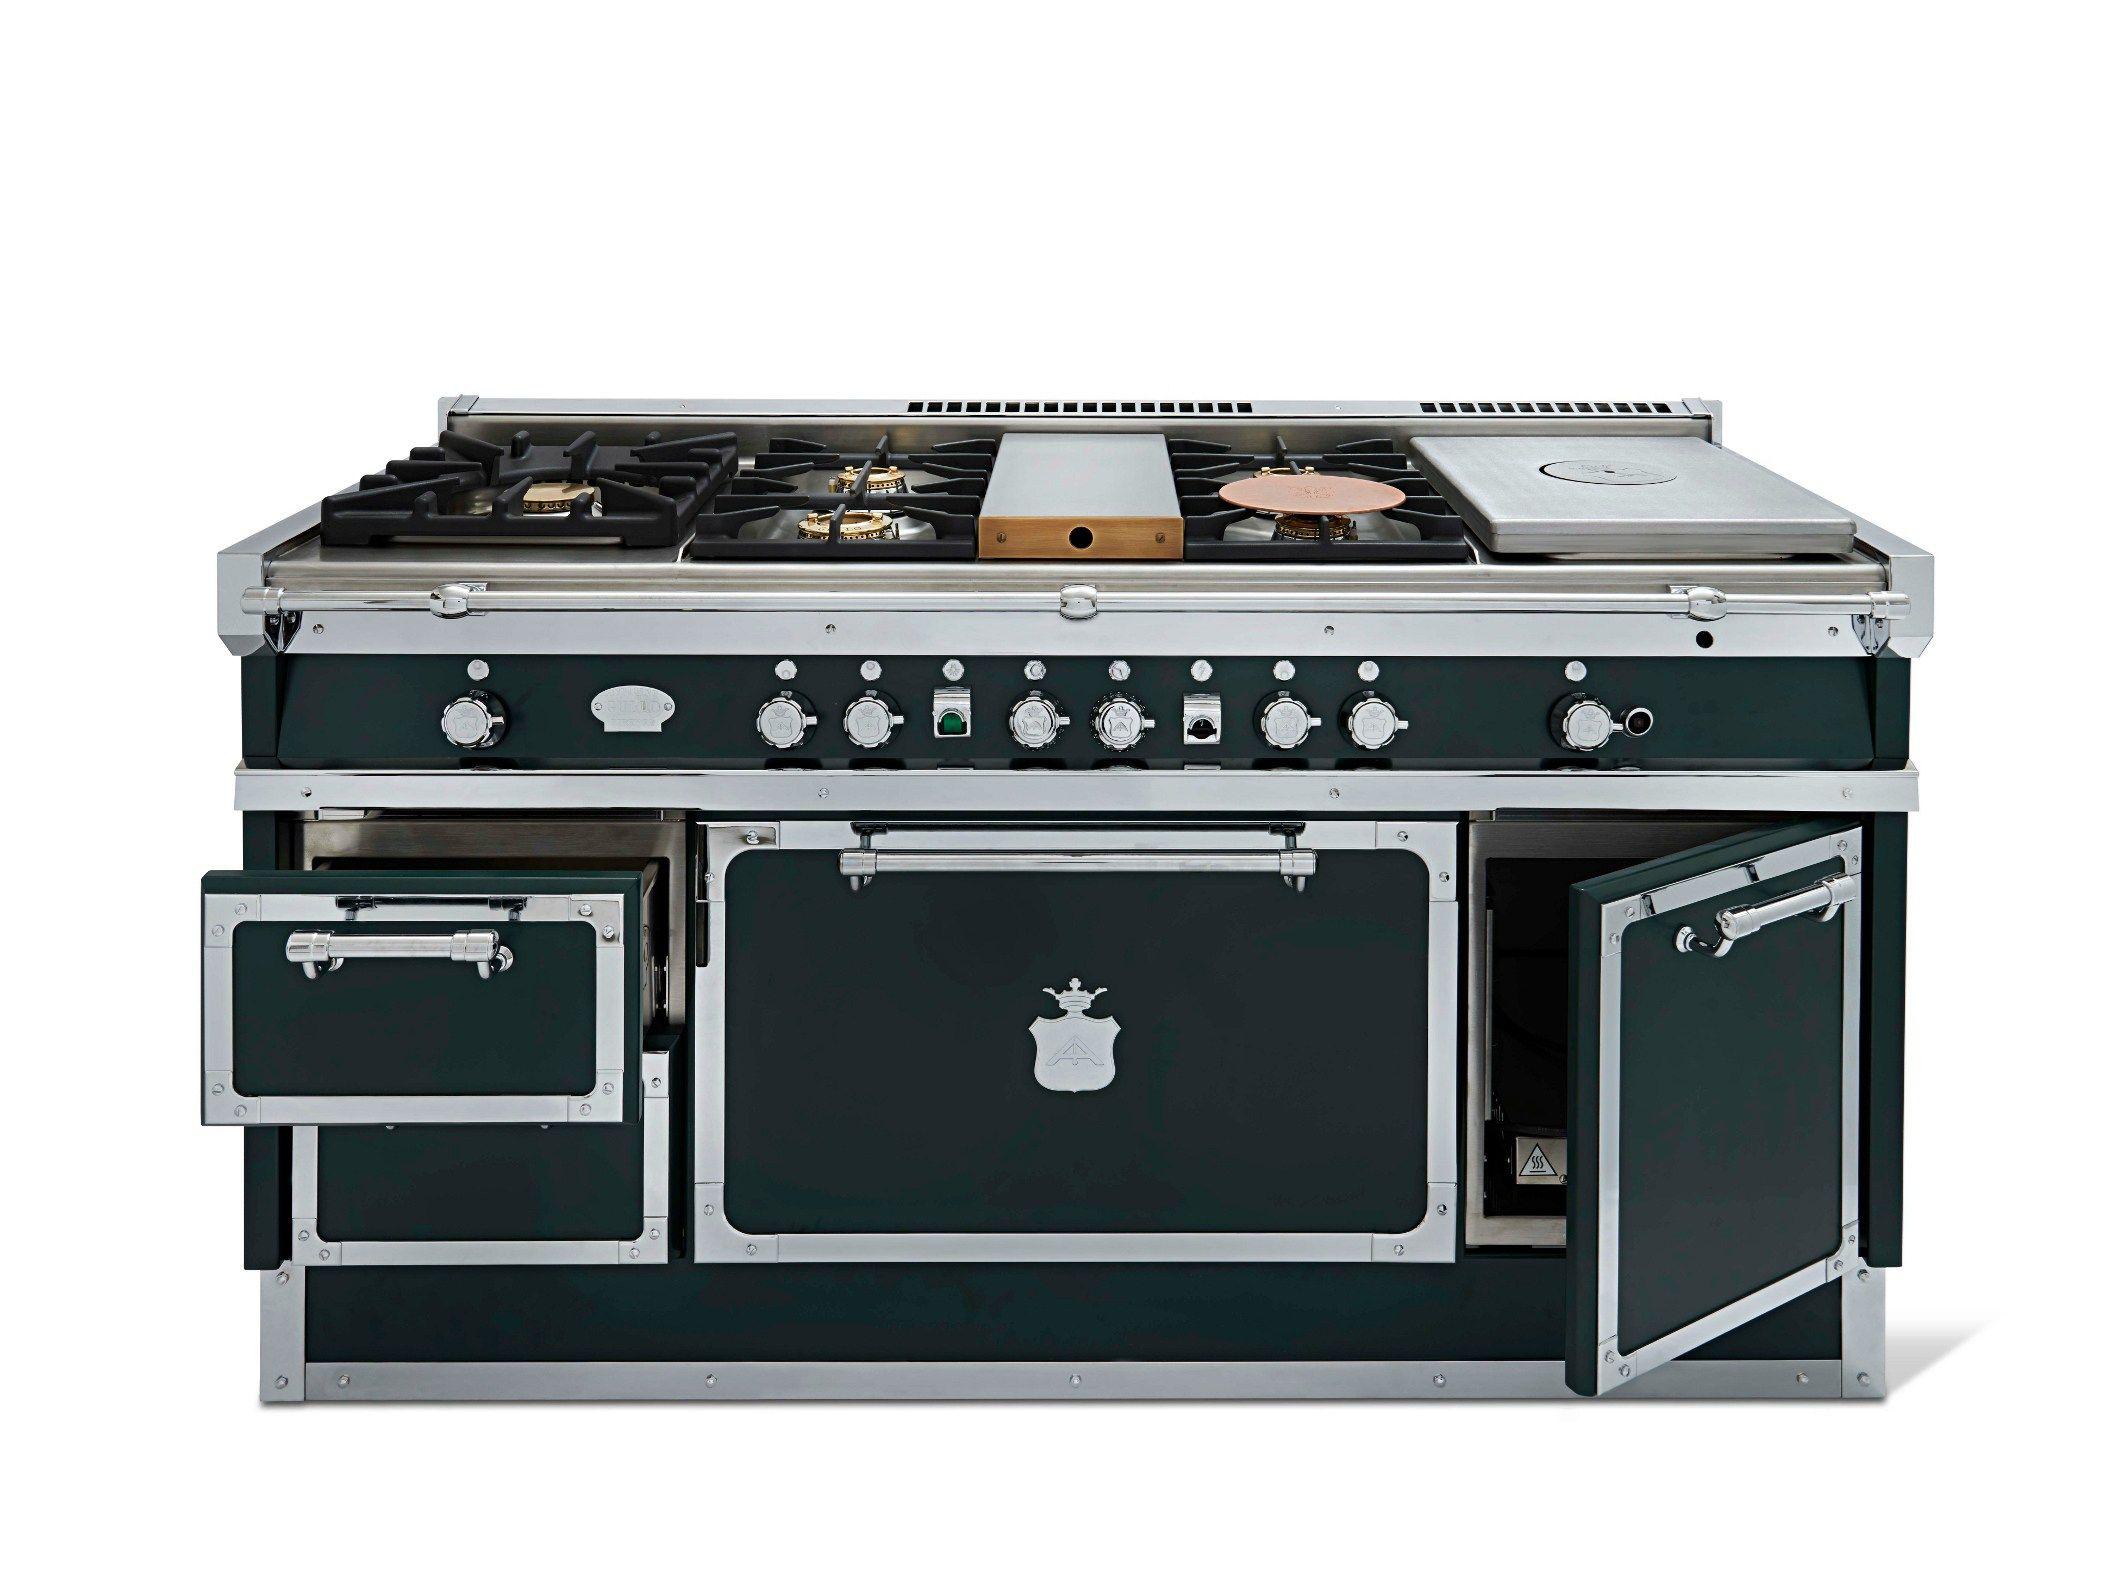 Top cucina acciaio inox prezzo cool top cucina acciaio - Top cucina acciaio prezzi ...